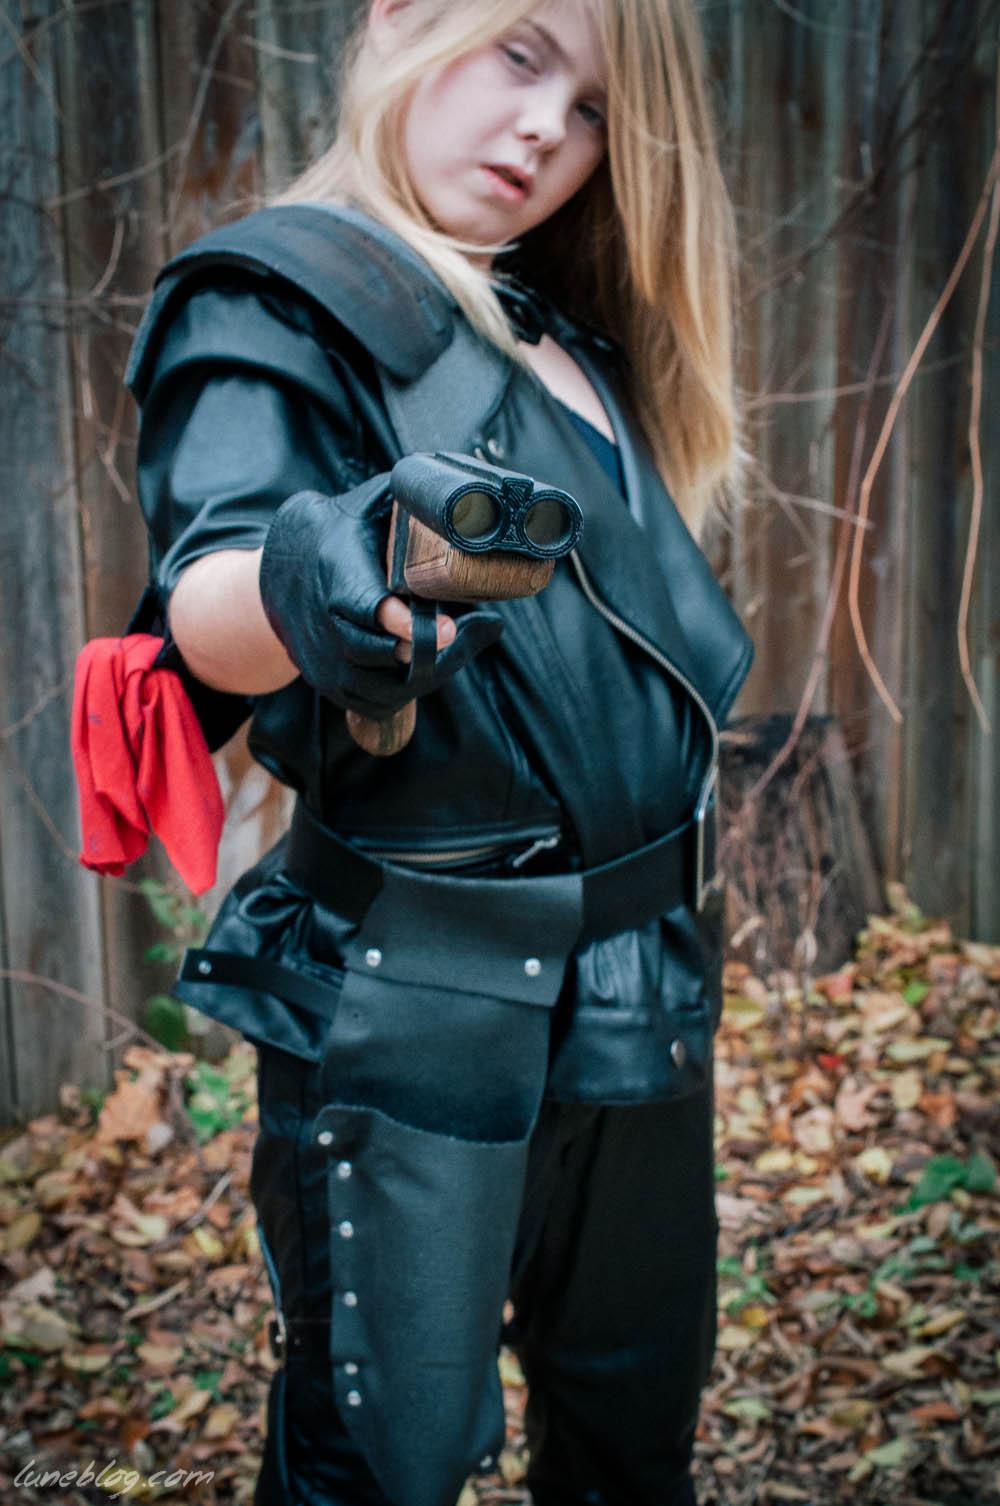 halloween costumes 2015 lune travels blog (25 of 39).jpg